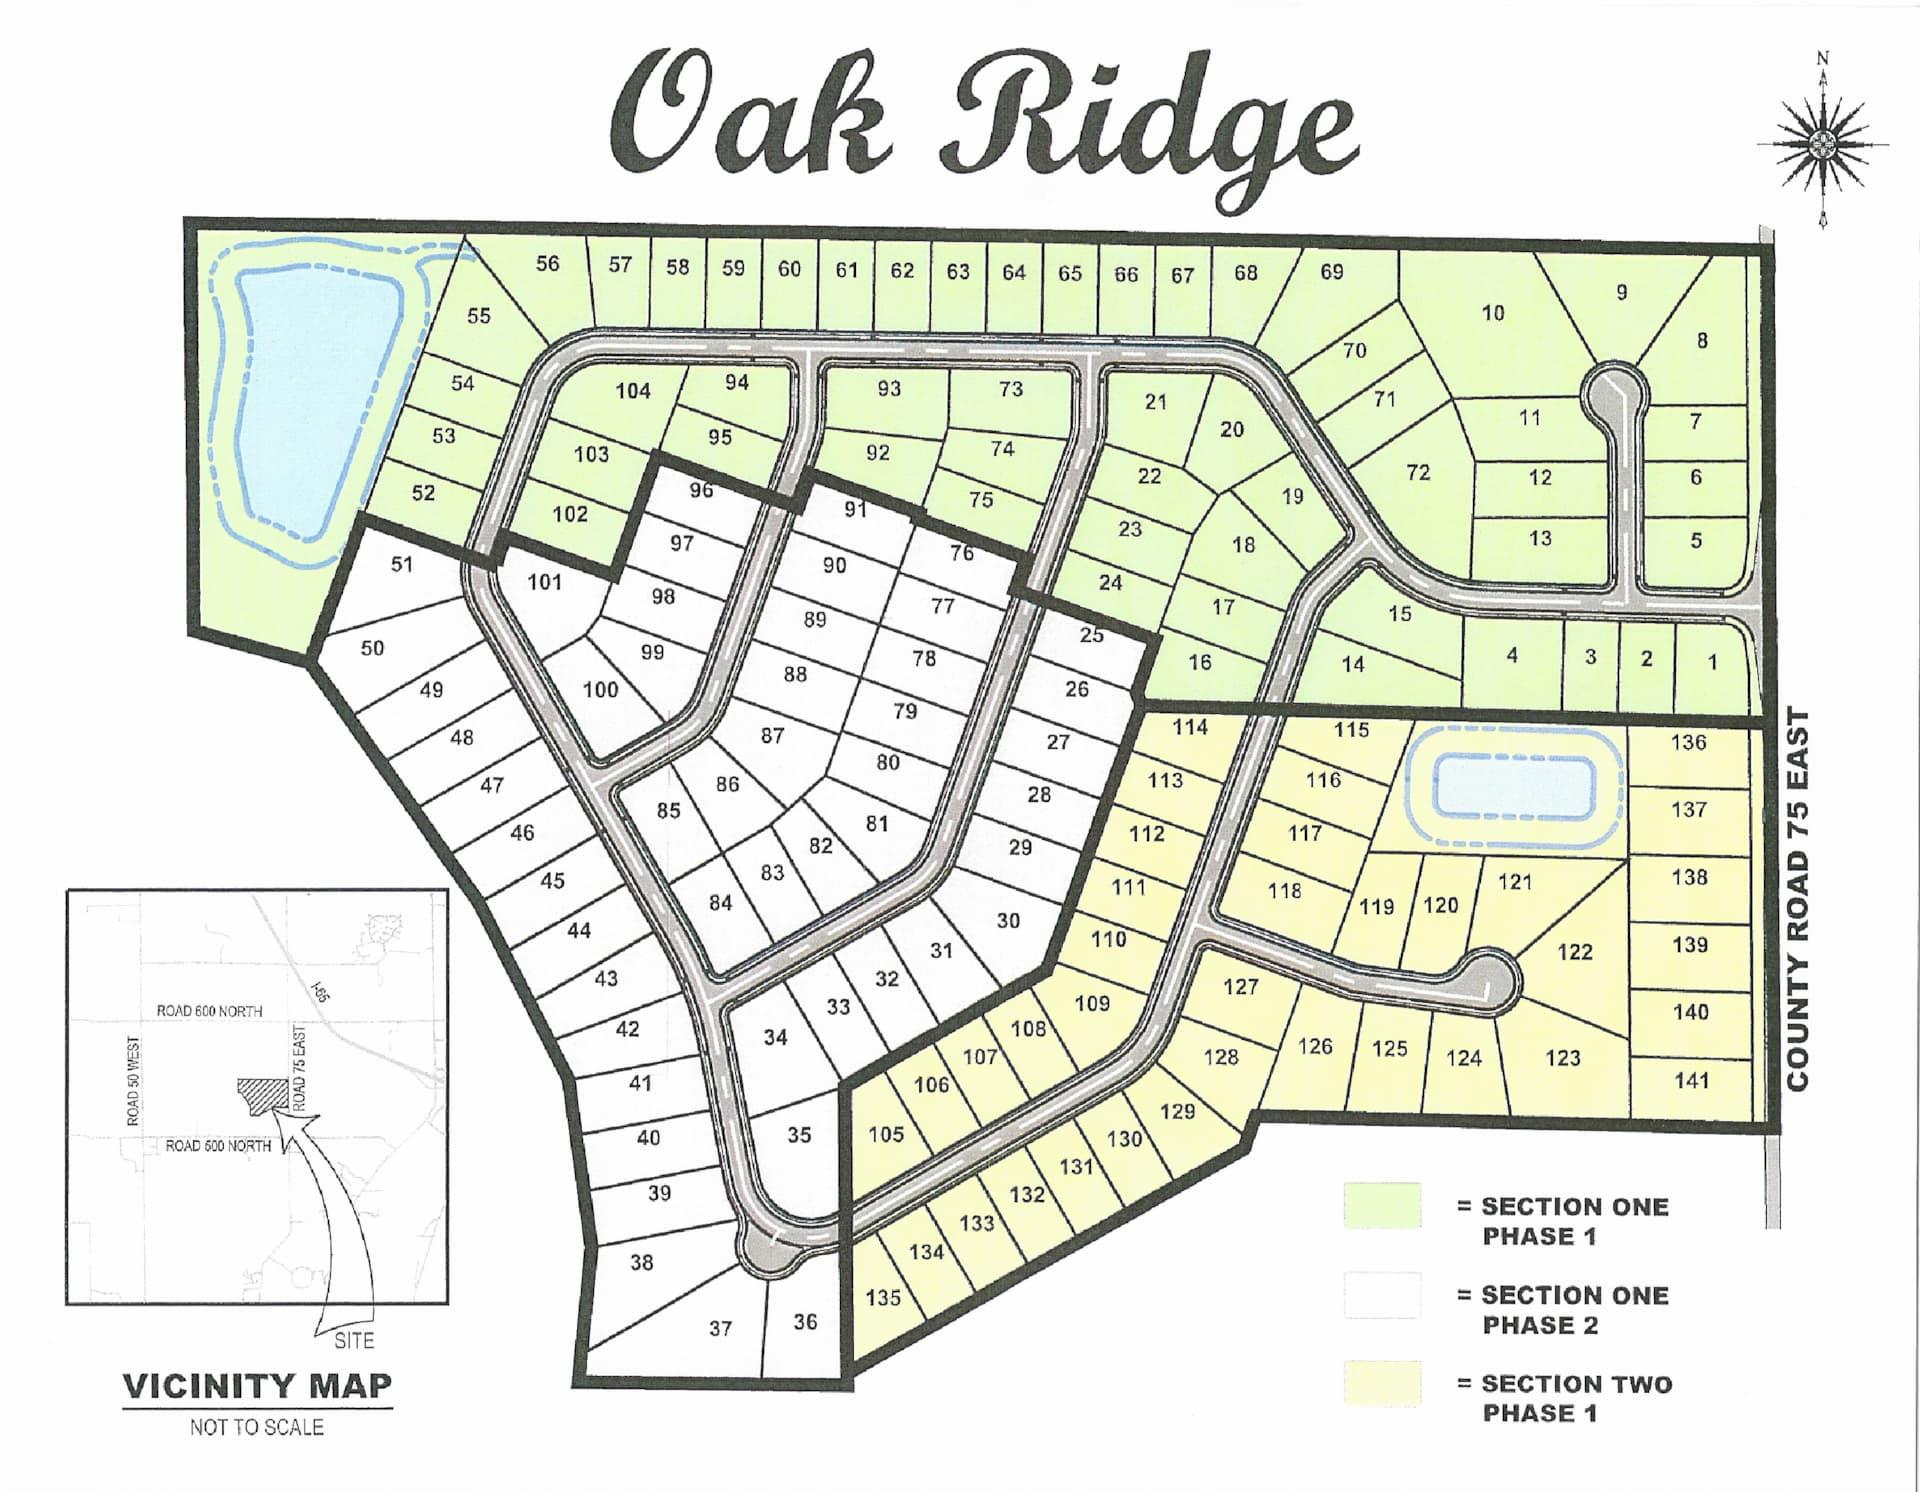 oak ridge community map